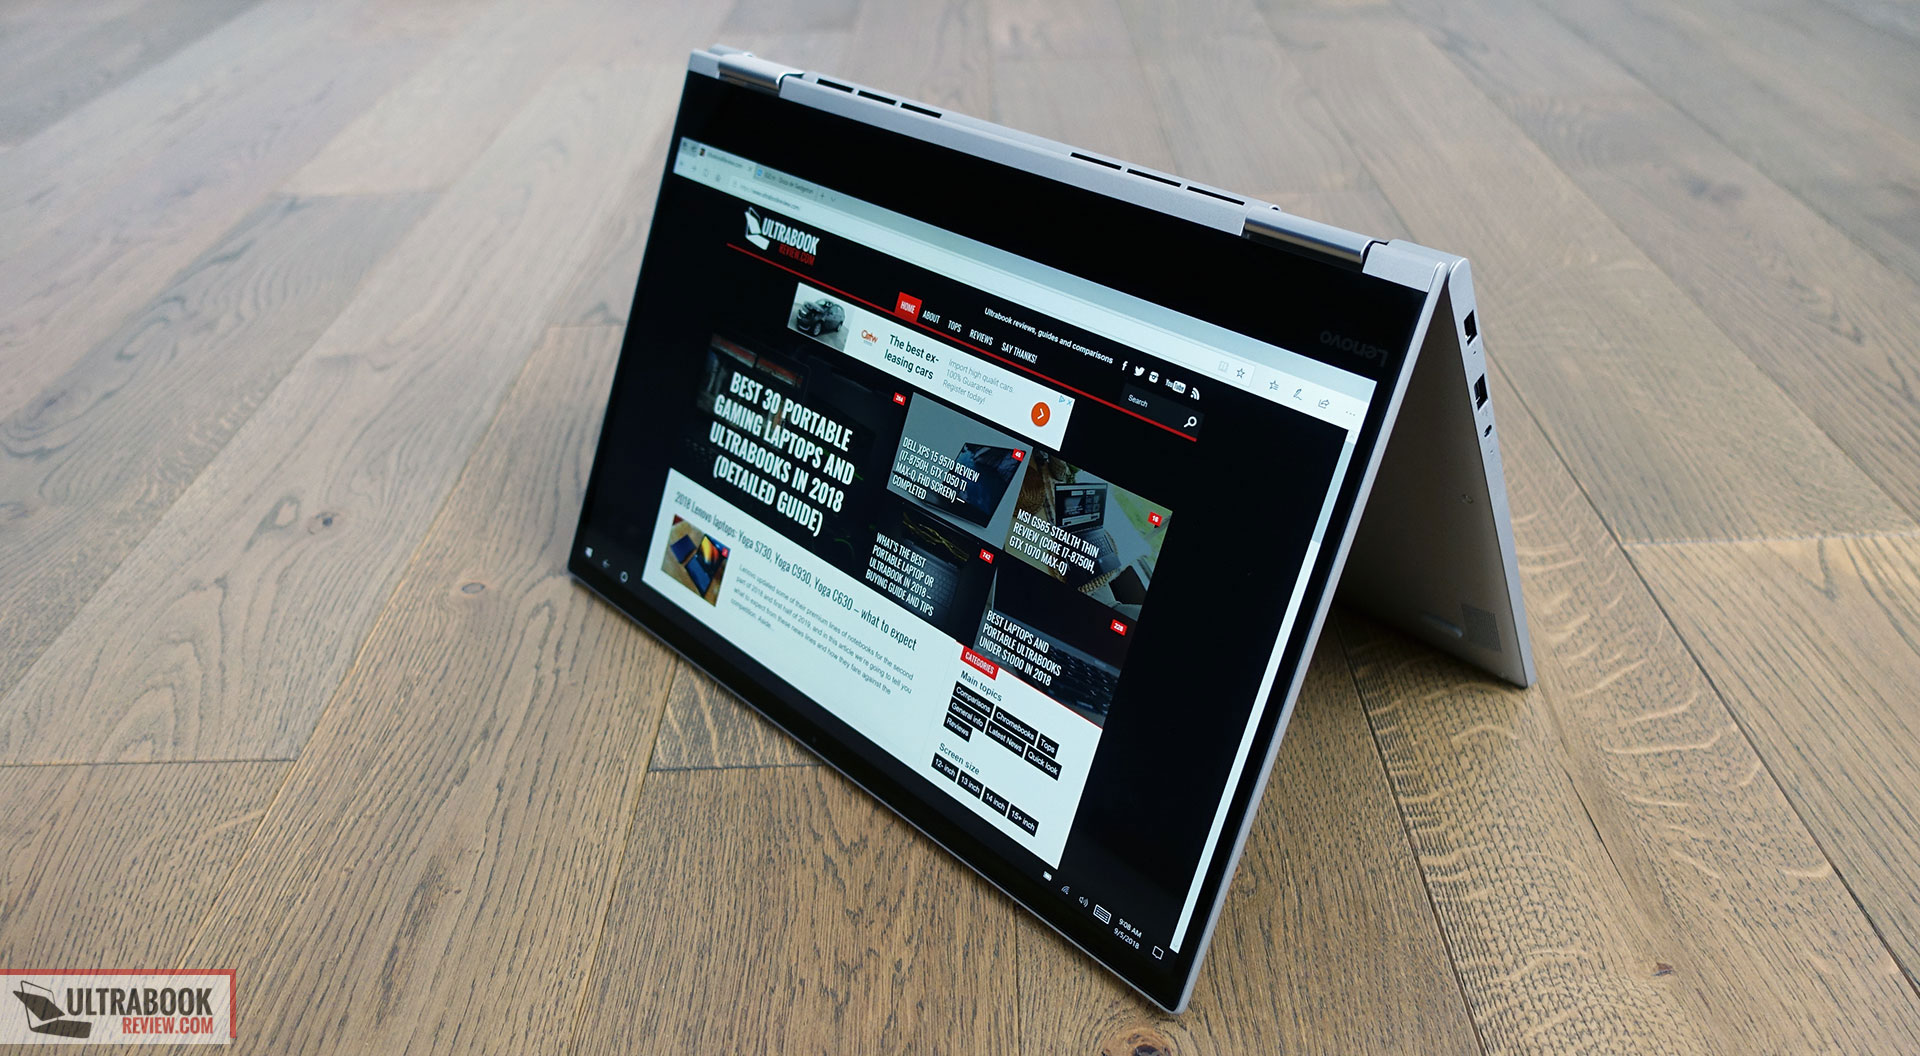 Lenovo Yoga 730 15 review (Yoga 730-15IKB model - i7-8550U